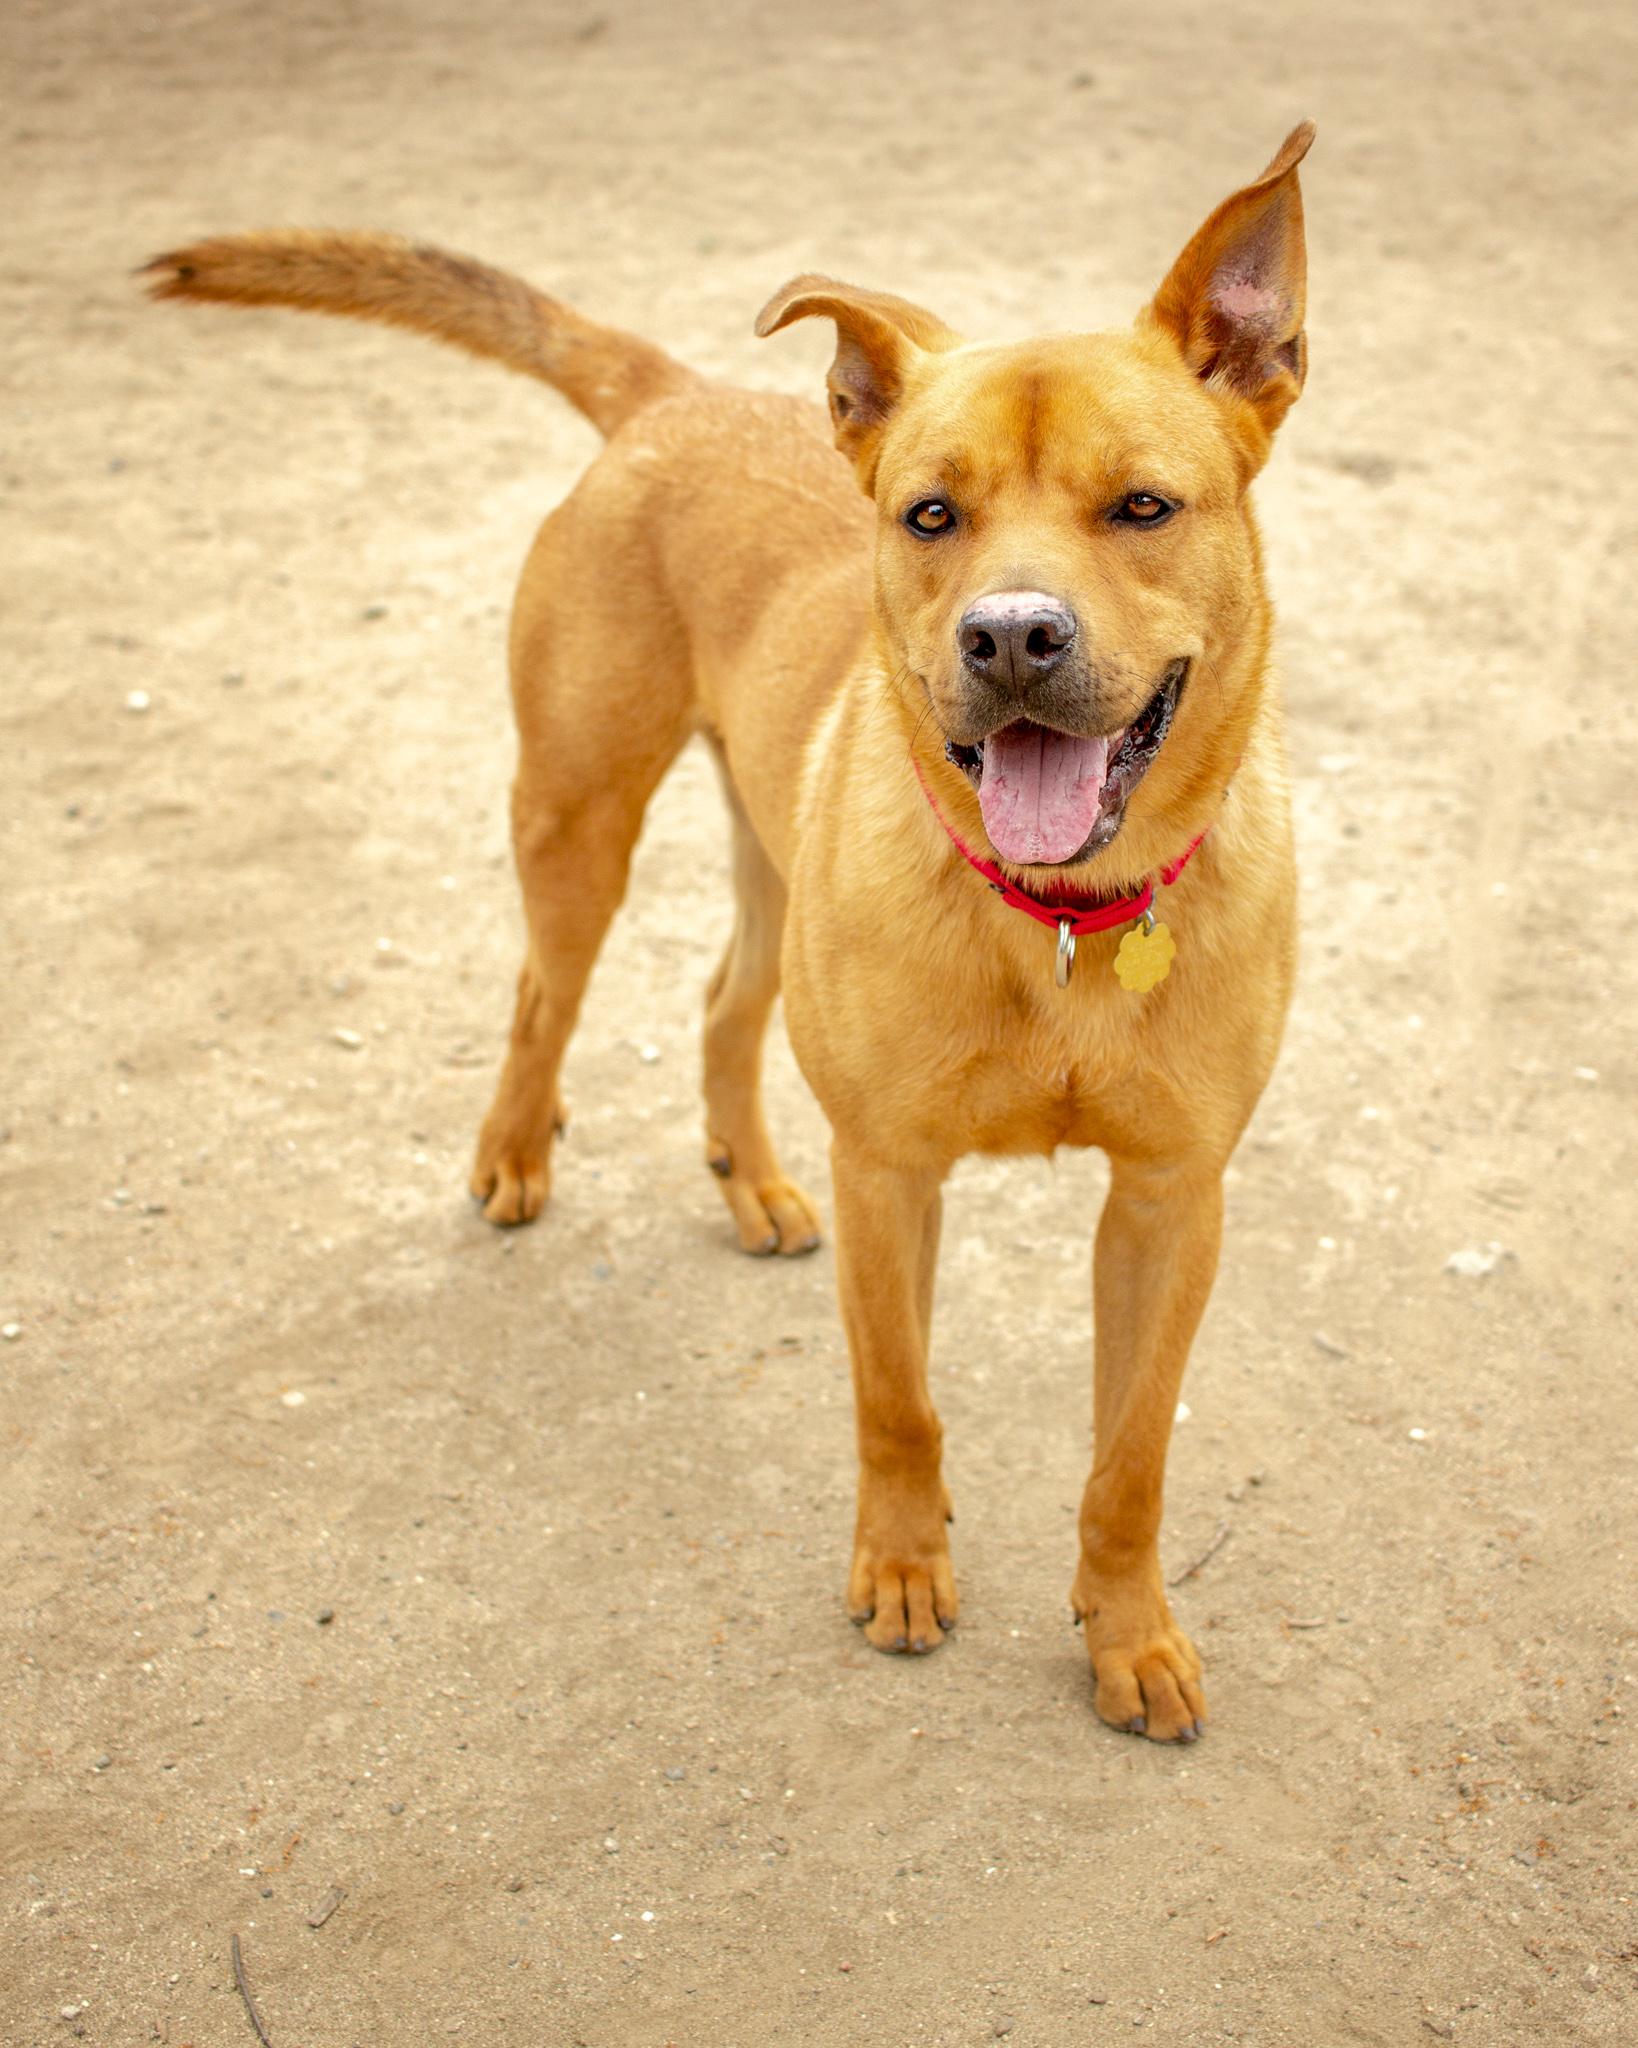 399-Orange-County-Dog-Photography-Steamer-Lee-Southern-California-SBACC.JPG